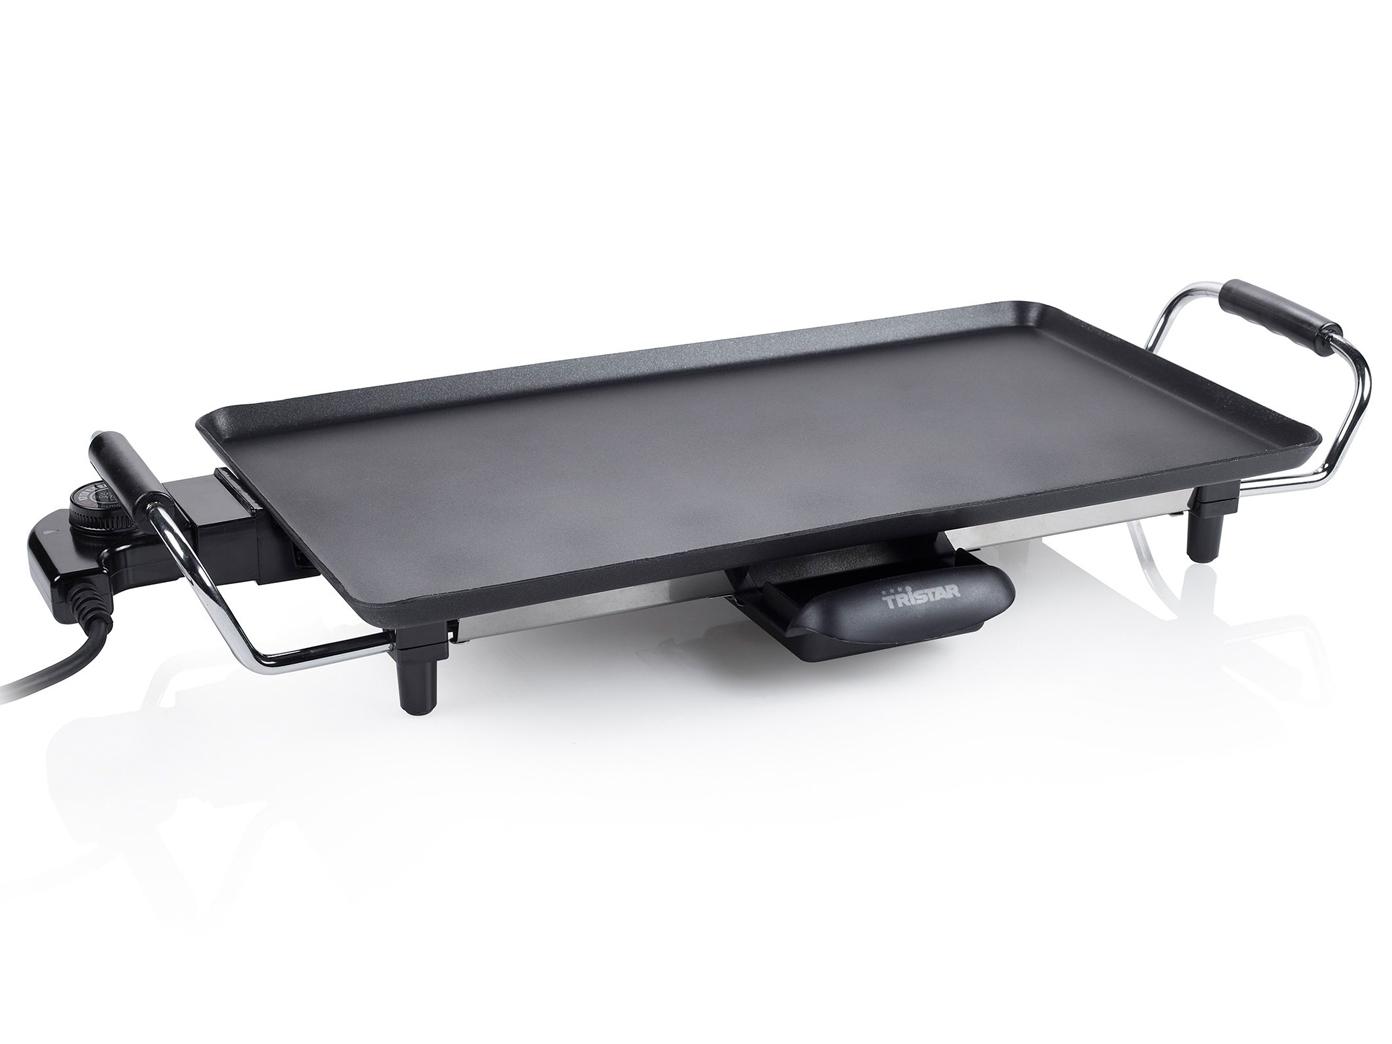 teppan yaki tischgrill xl elektrogrill partygrill balkon 2000w fettarm grillen ebay. Black Bedroom Furniture Sets. Home Design Ideas